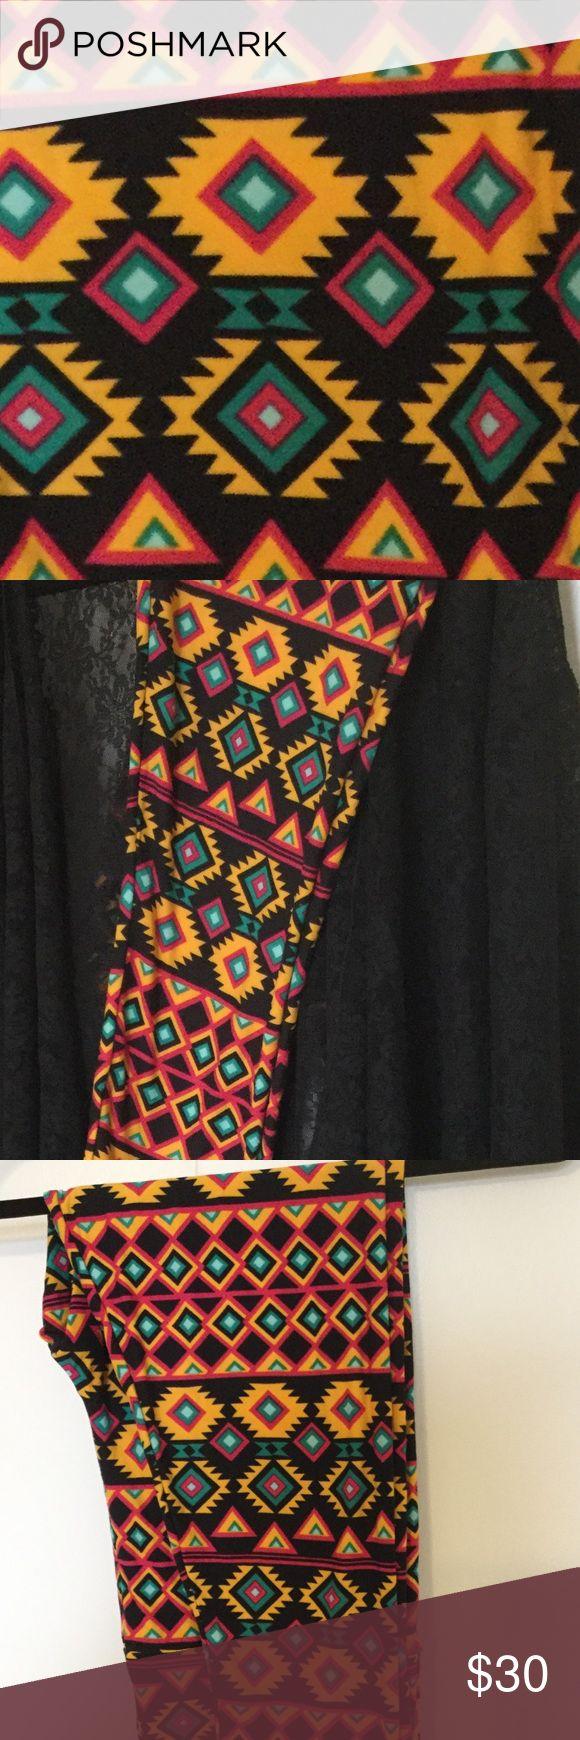 New! TC leggings! Super cute Aztec.  LuLaRoe. New! TC leggings! Super cute Aztec.  LuLaRoe. Bundle 2or more and make offer. 😀 LuLaRoe Pants Leggings